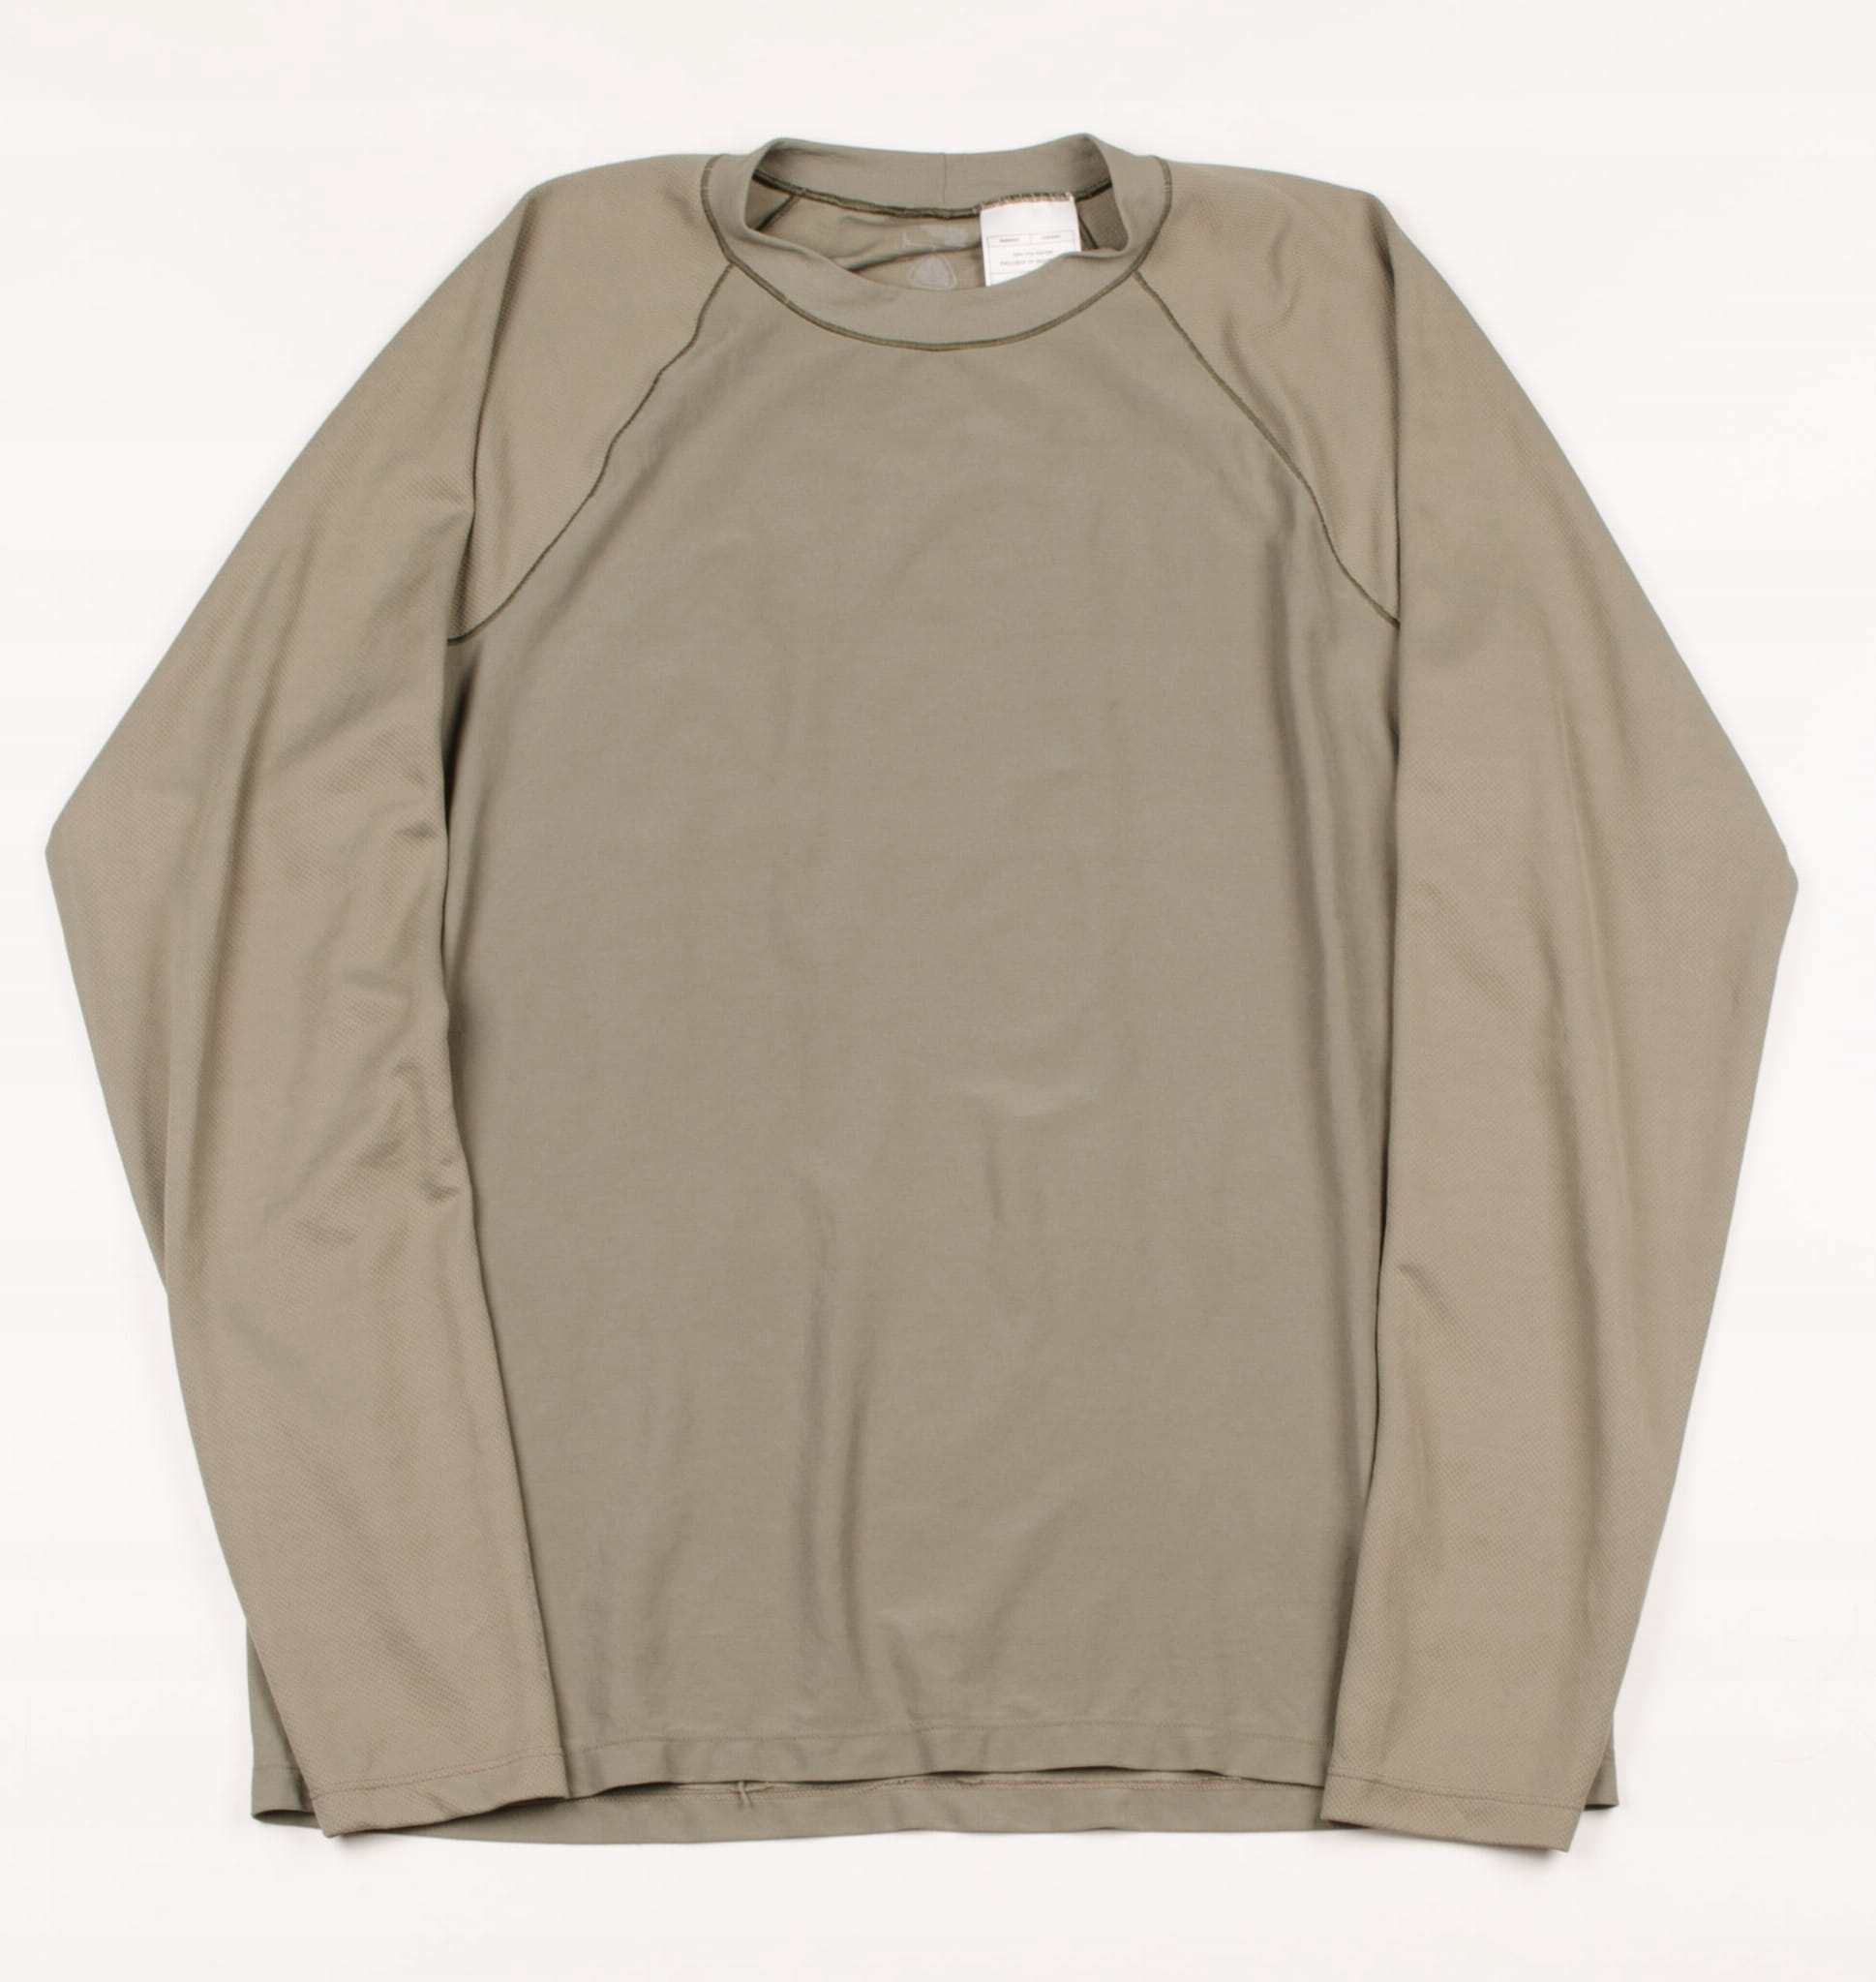 28566 Nike Koszulka Sportowa Męska L